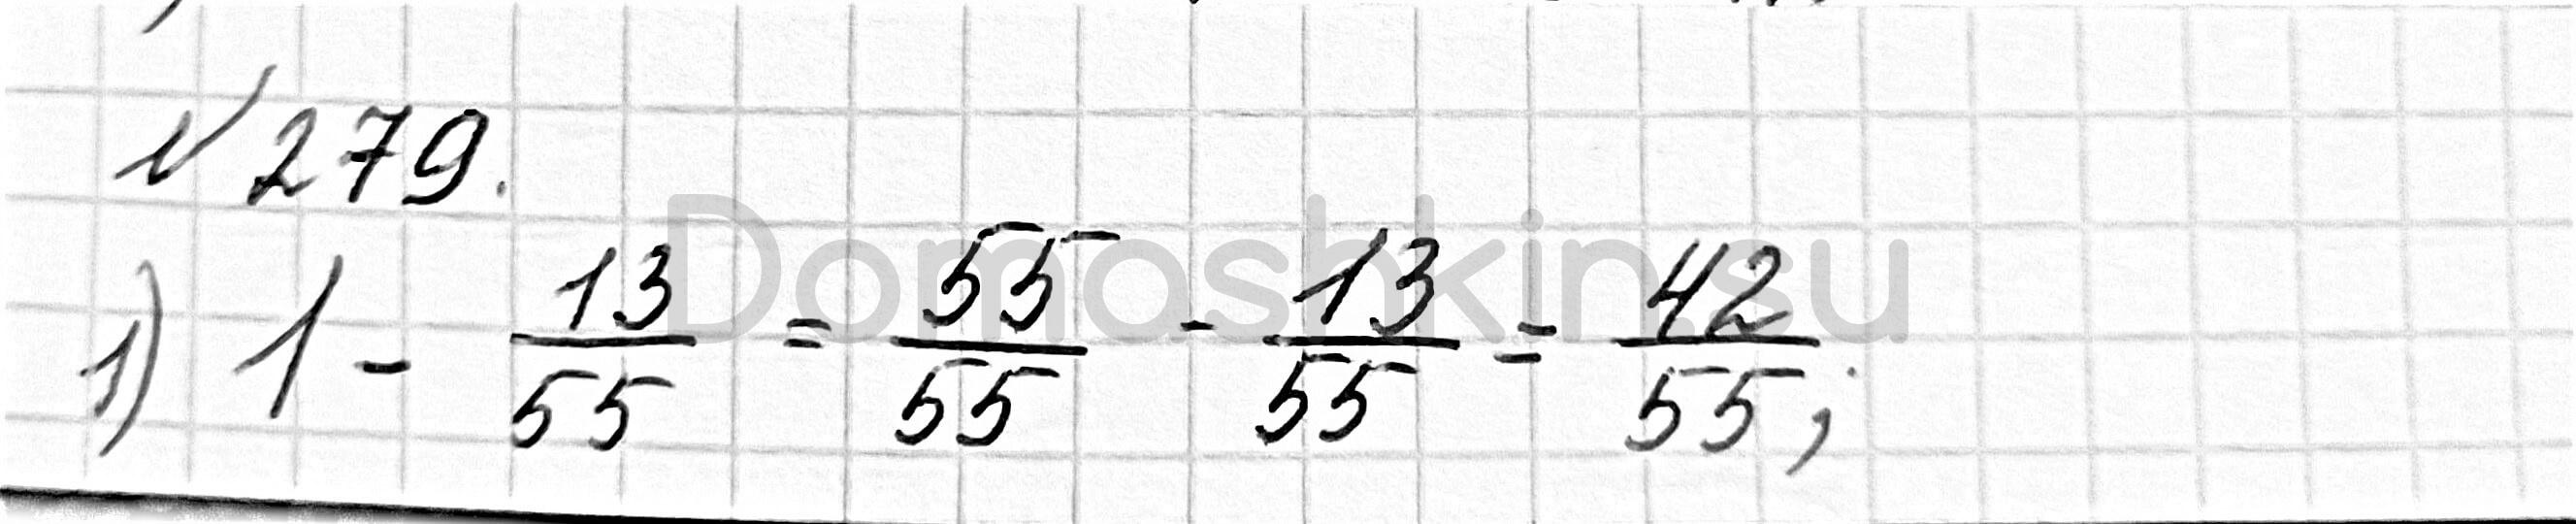 Математика 6 класс учебник Мерзляк номер 279 решение